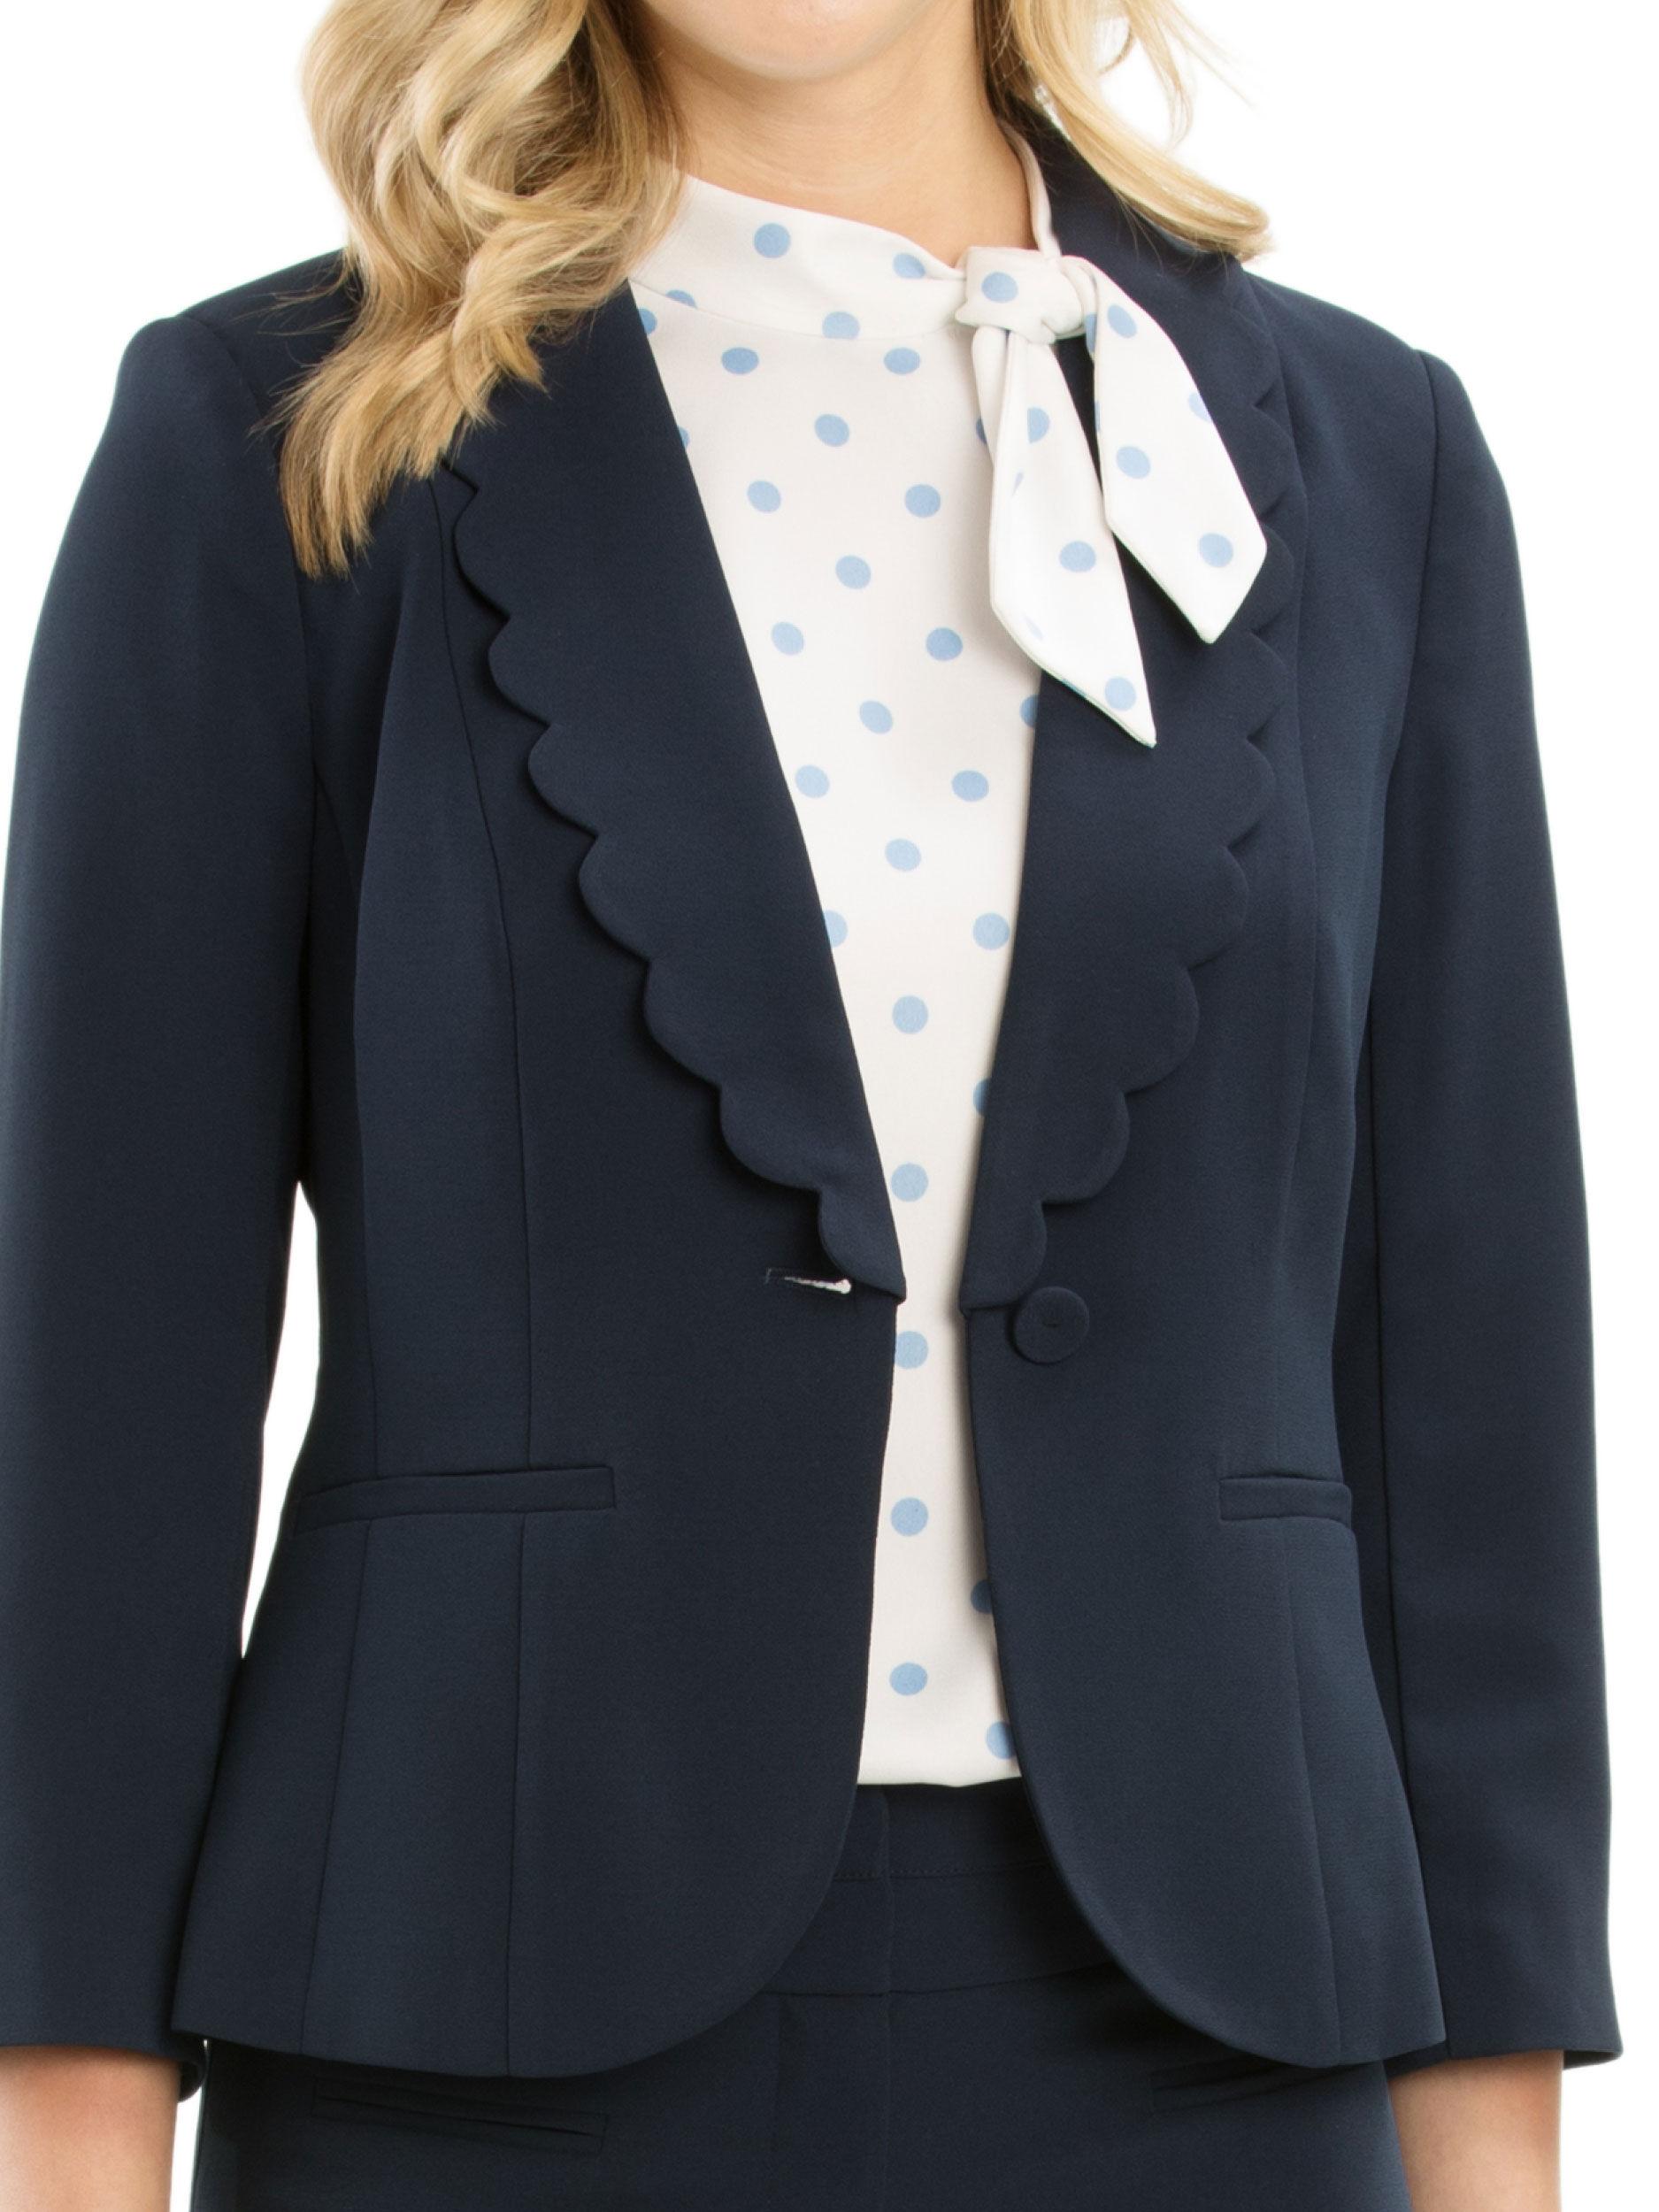 Polly Jacket